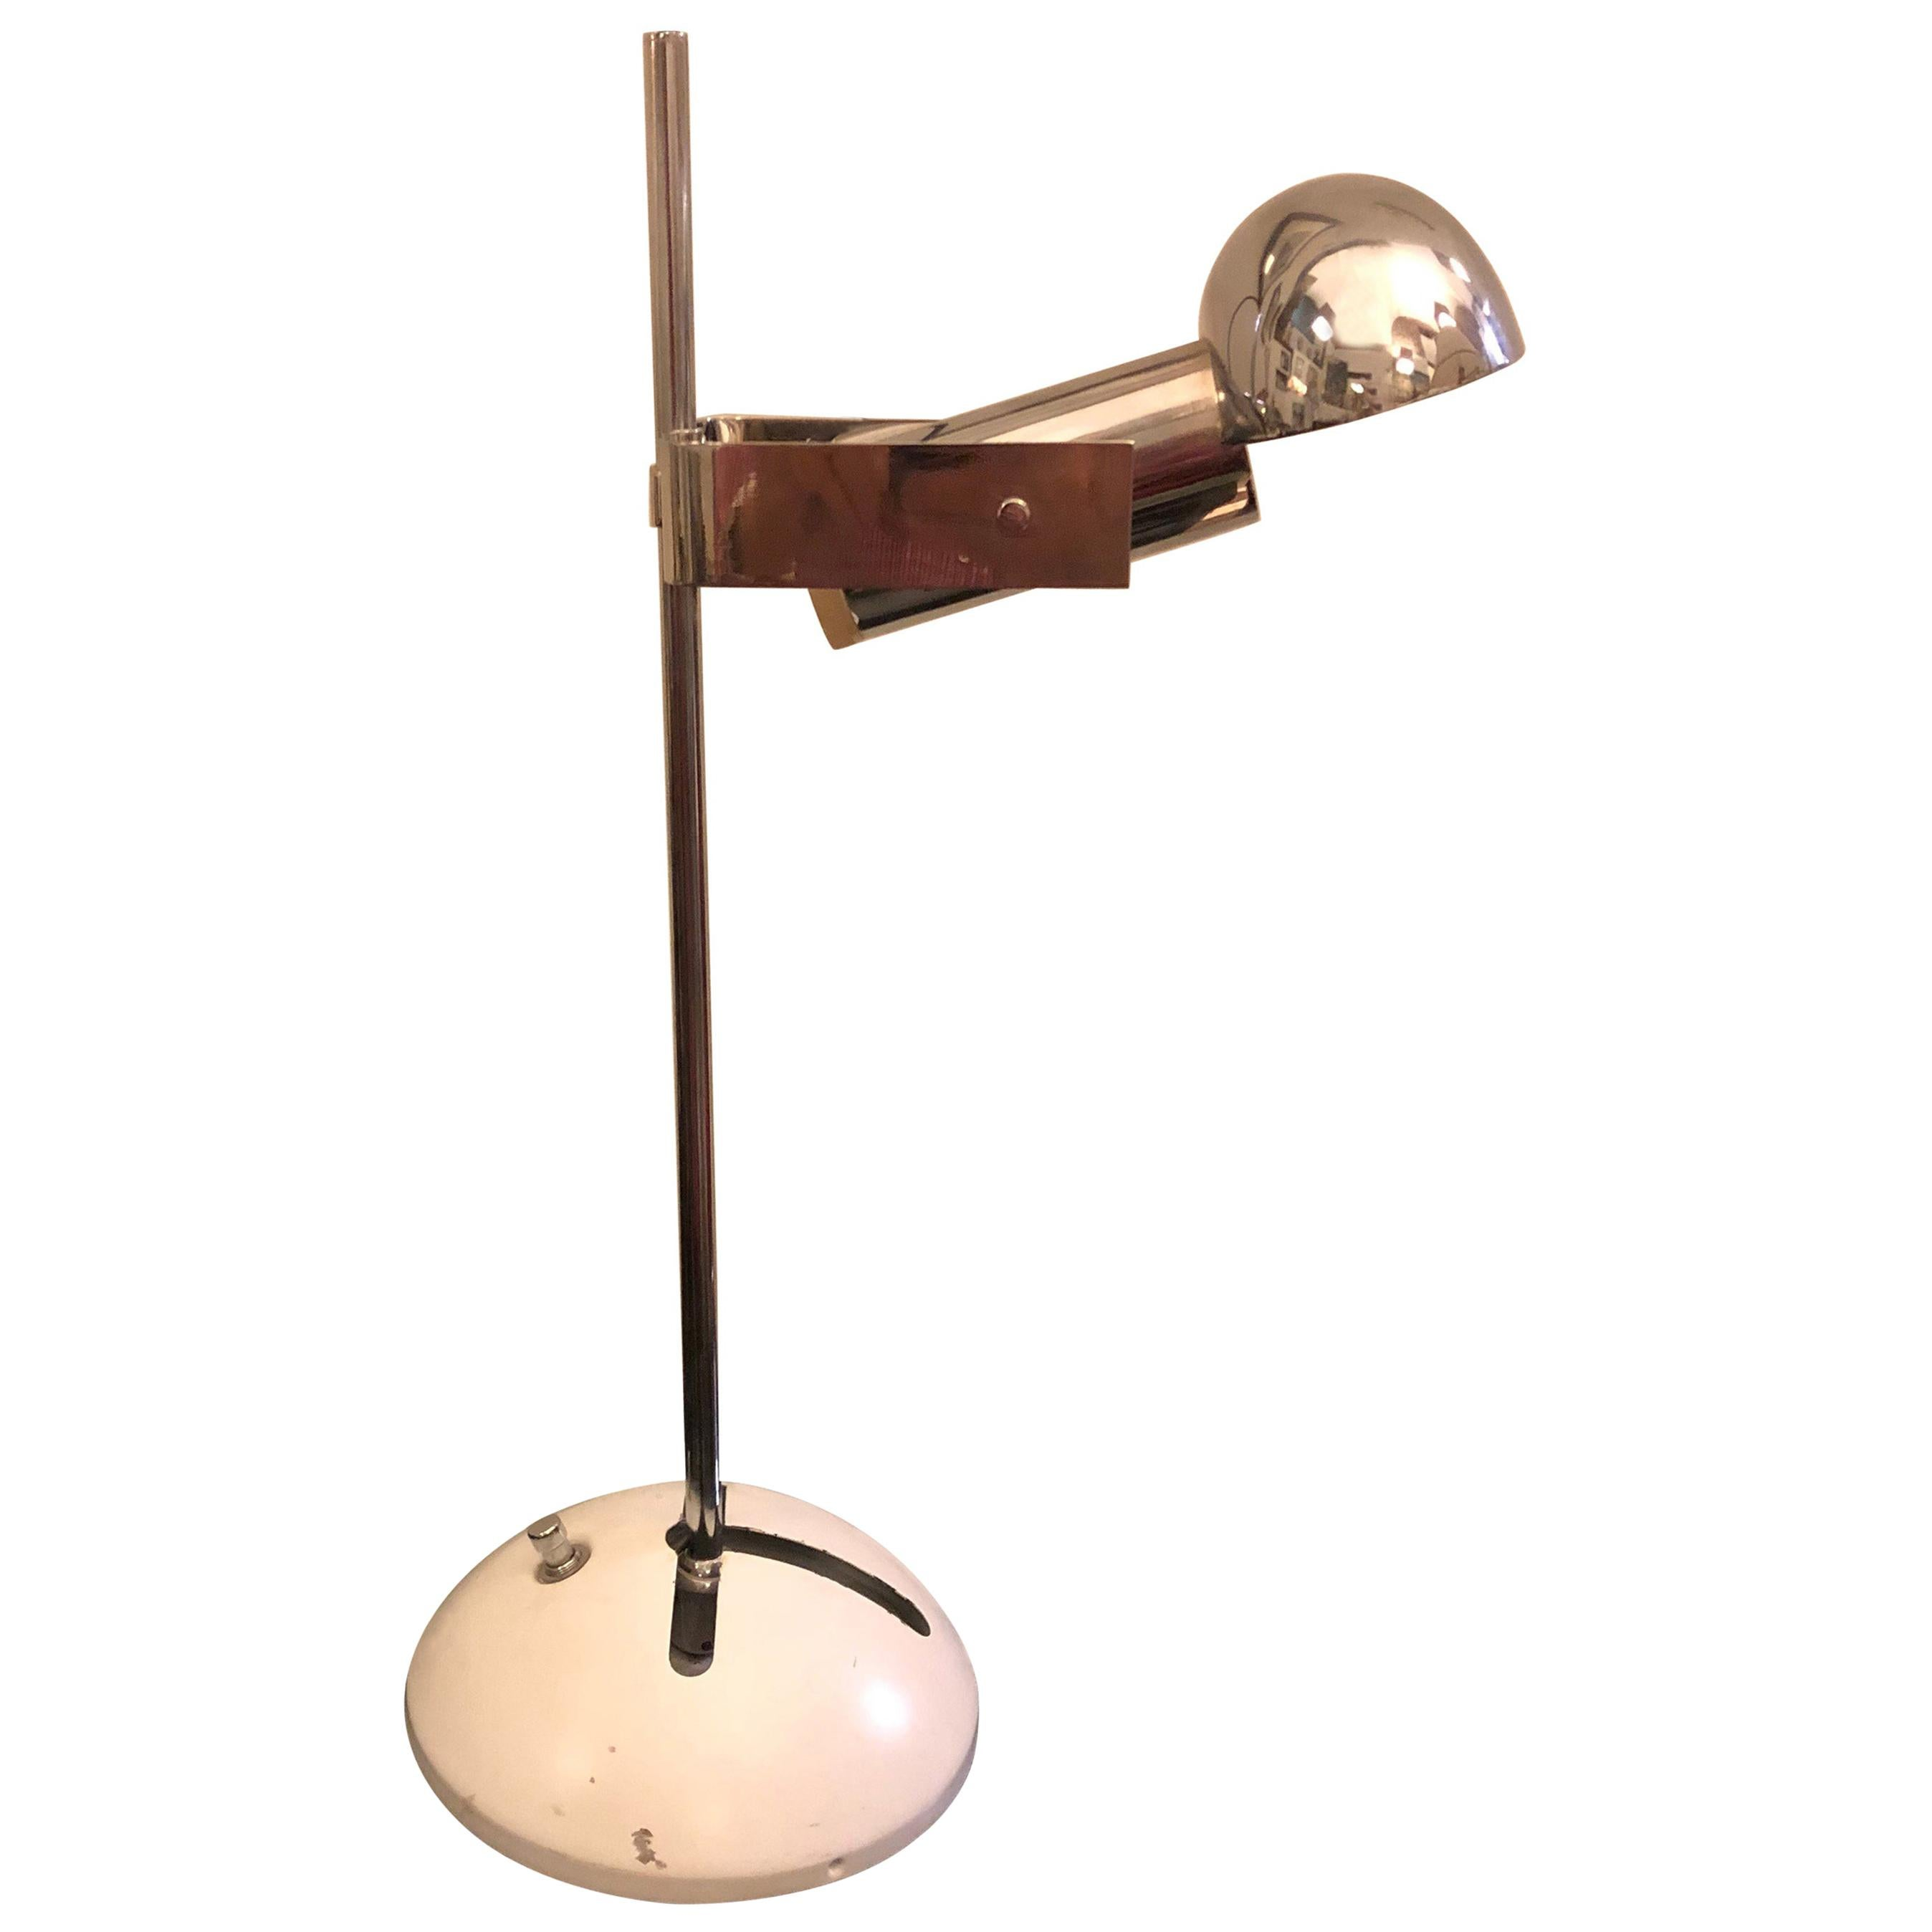 Robert Sonneman for Luci Milano Steel and White Metal Table Lamp, 1970s